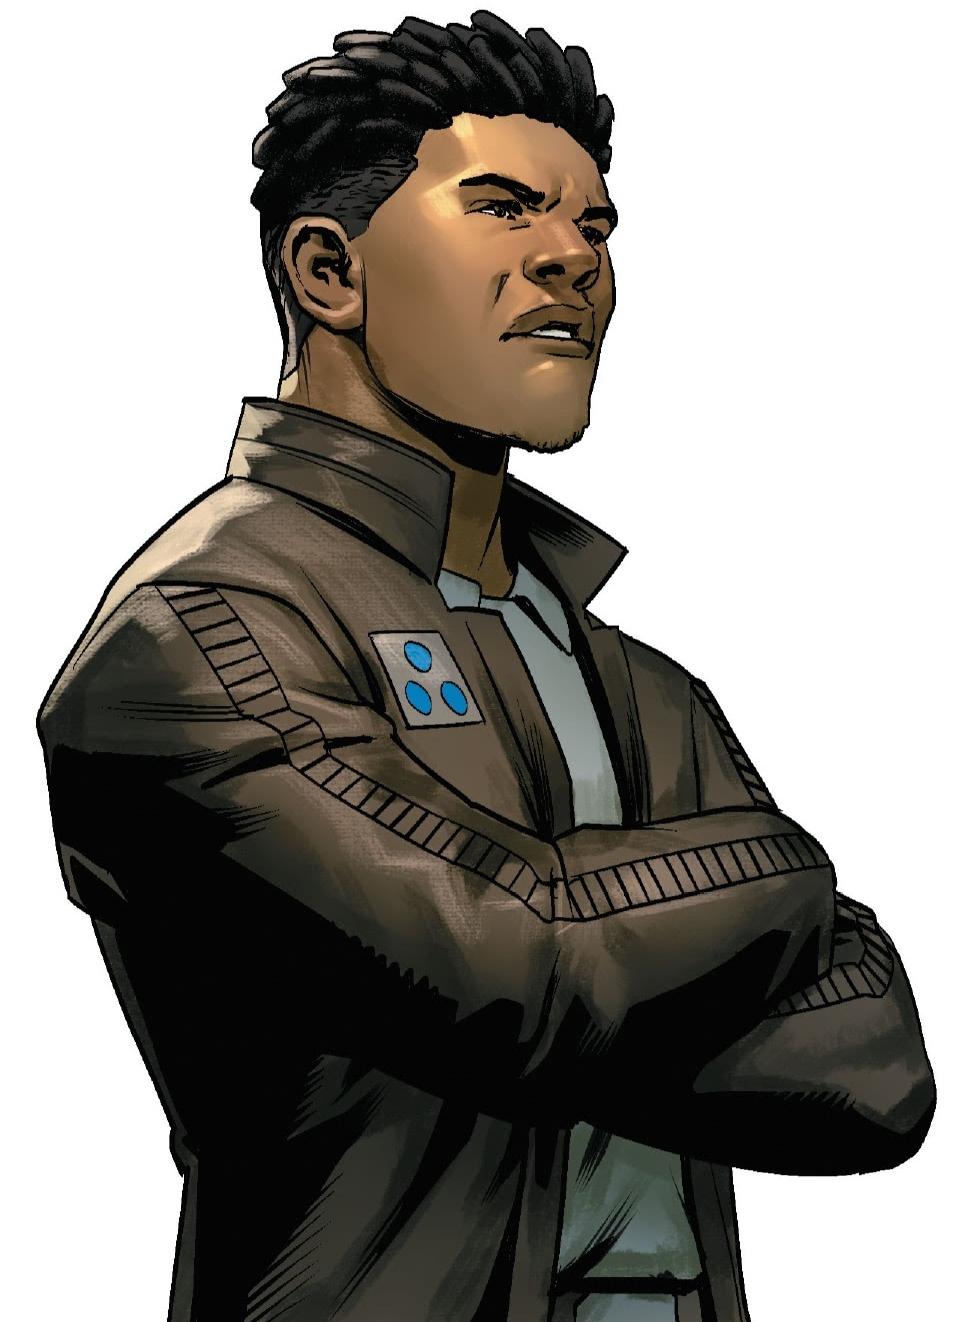 Grek (commander)